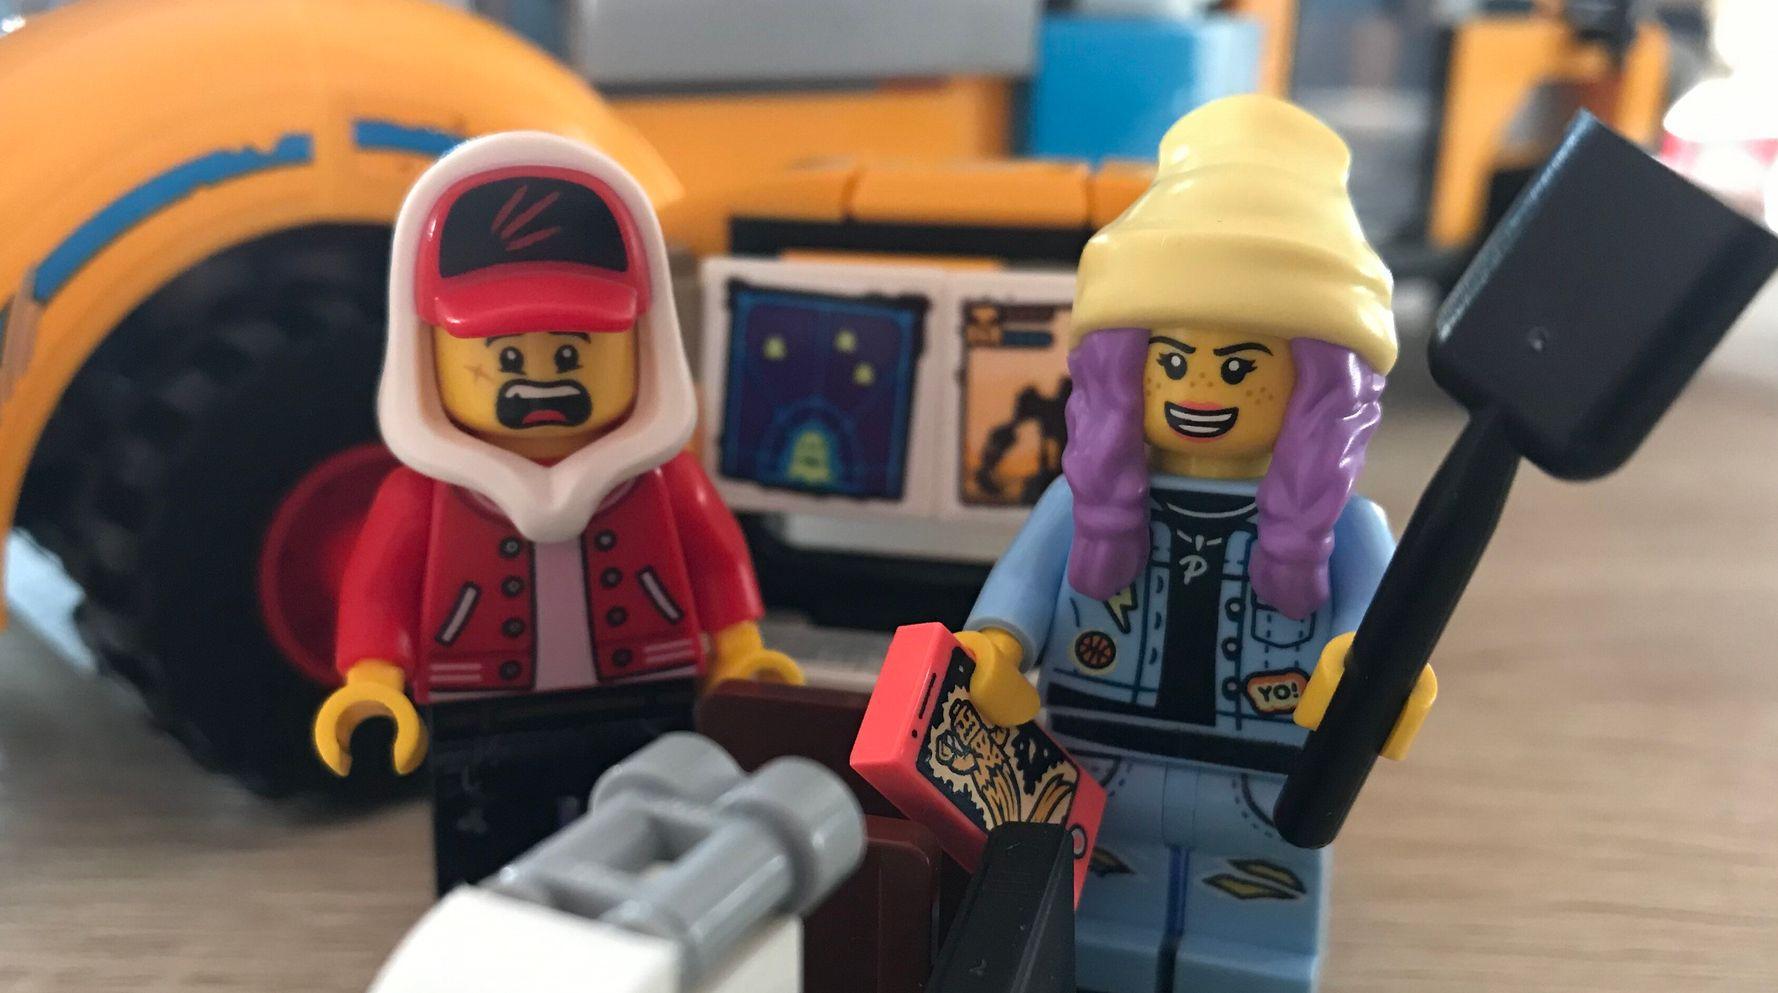 Lego's Hidden Side Range Is Part Nostalgia, Part Futuristic Fun – I Love It